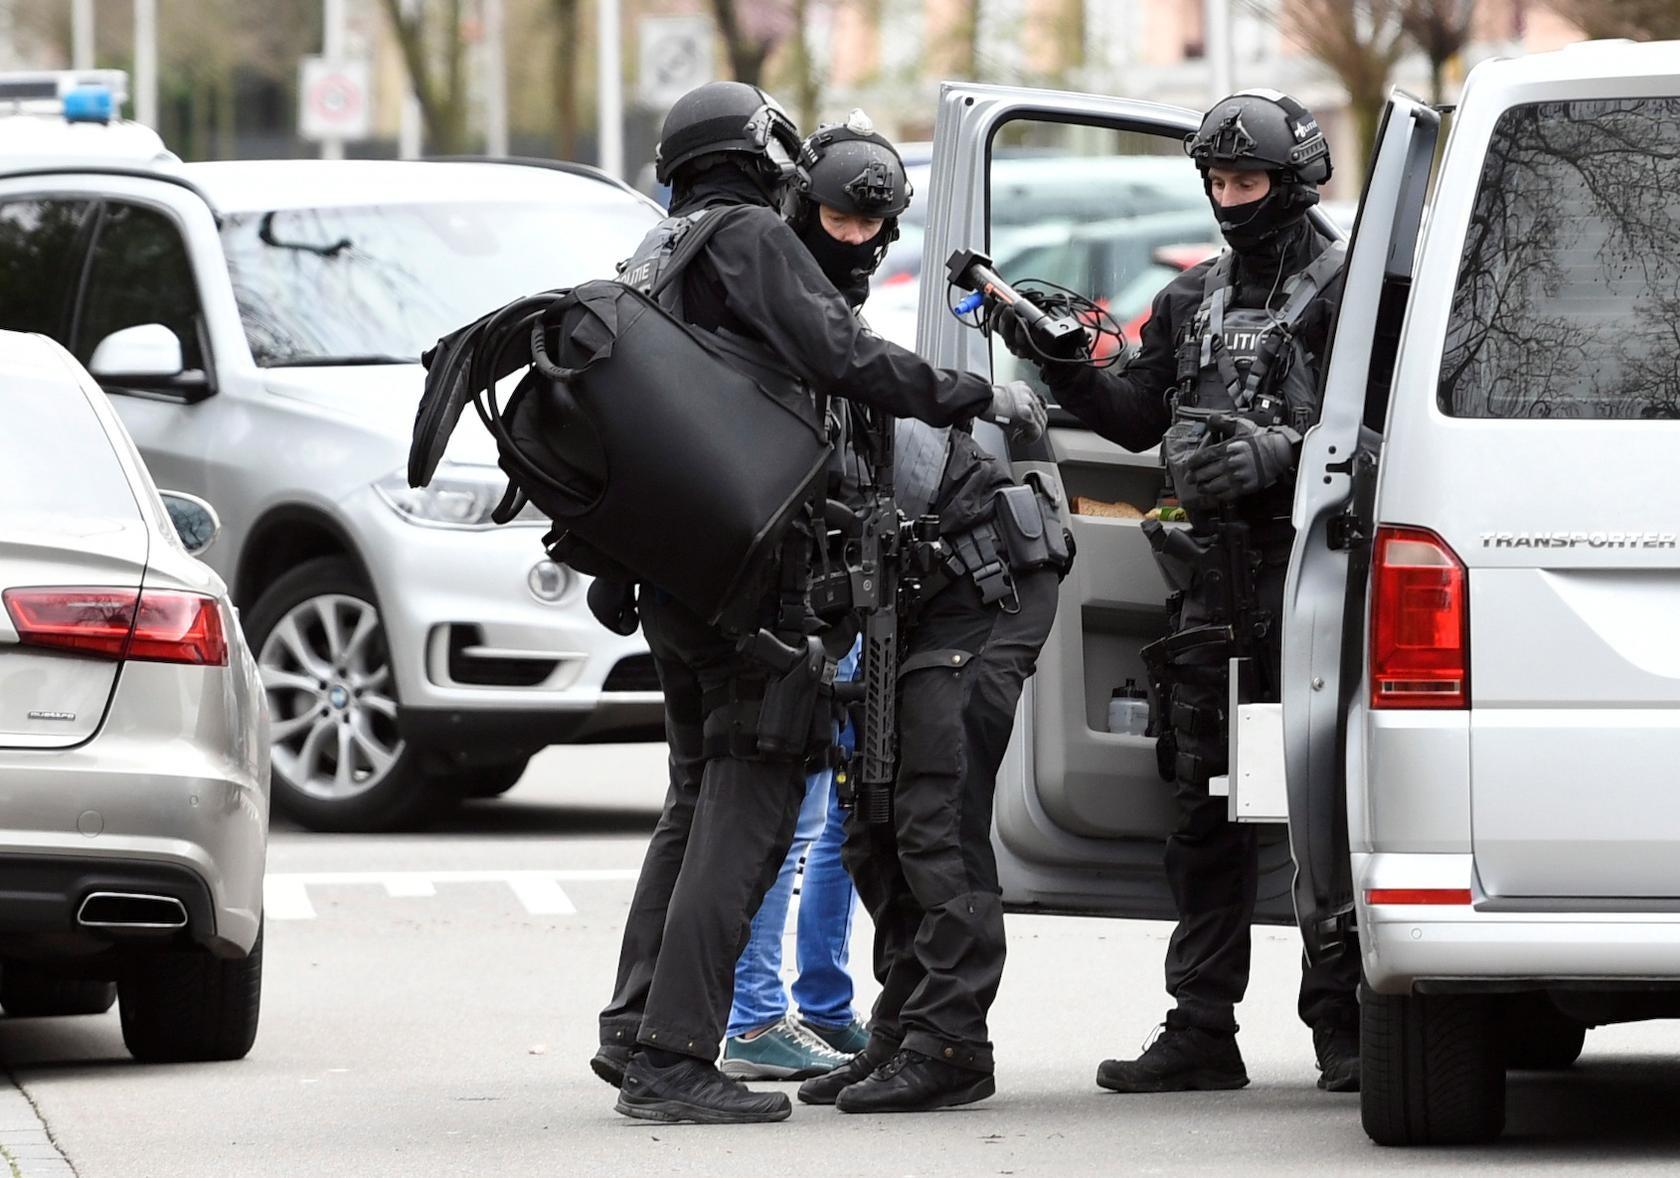 Three dead, nine injured in Utrecht shooting: Mayor